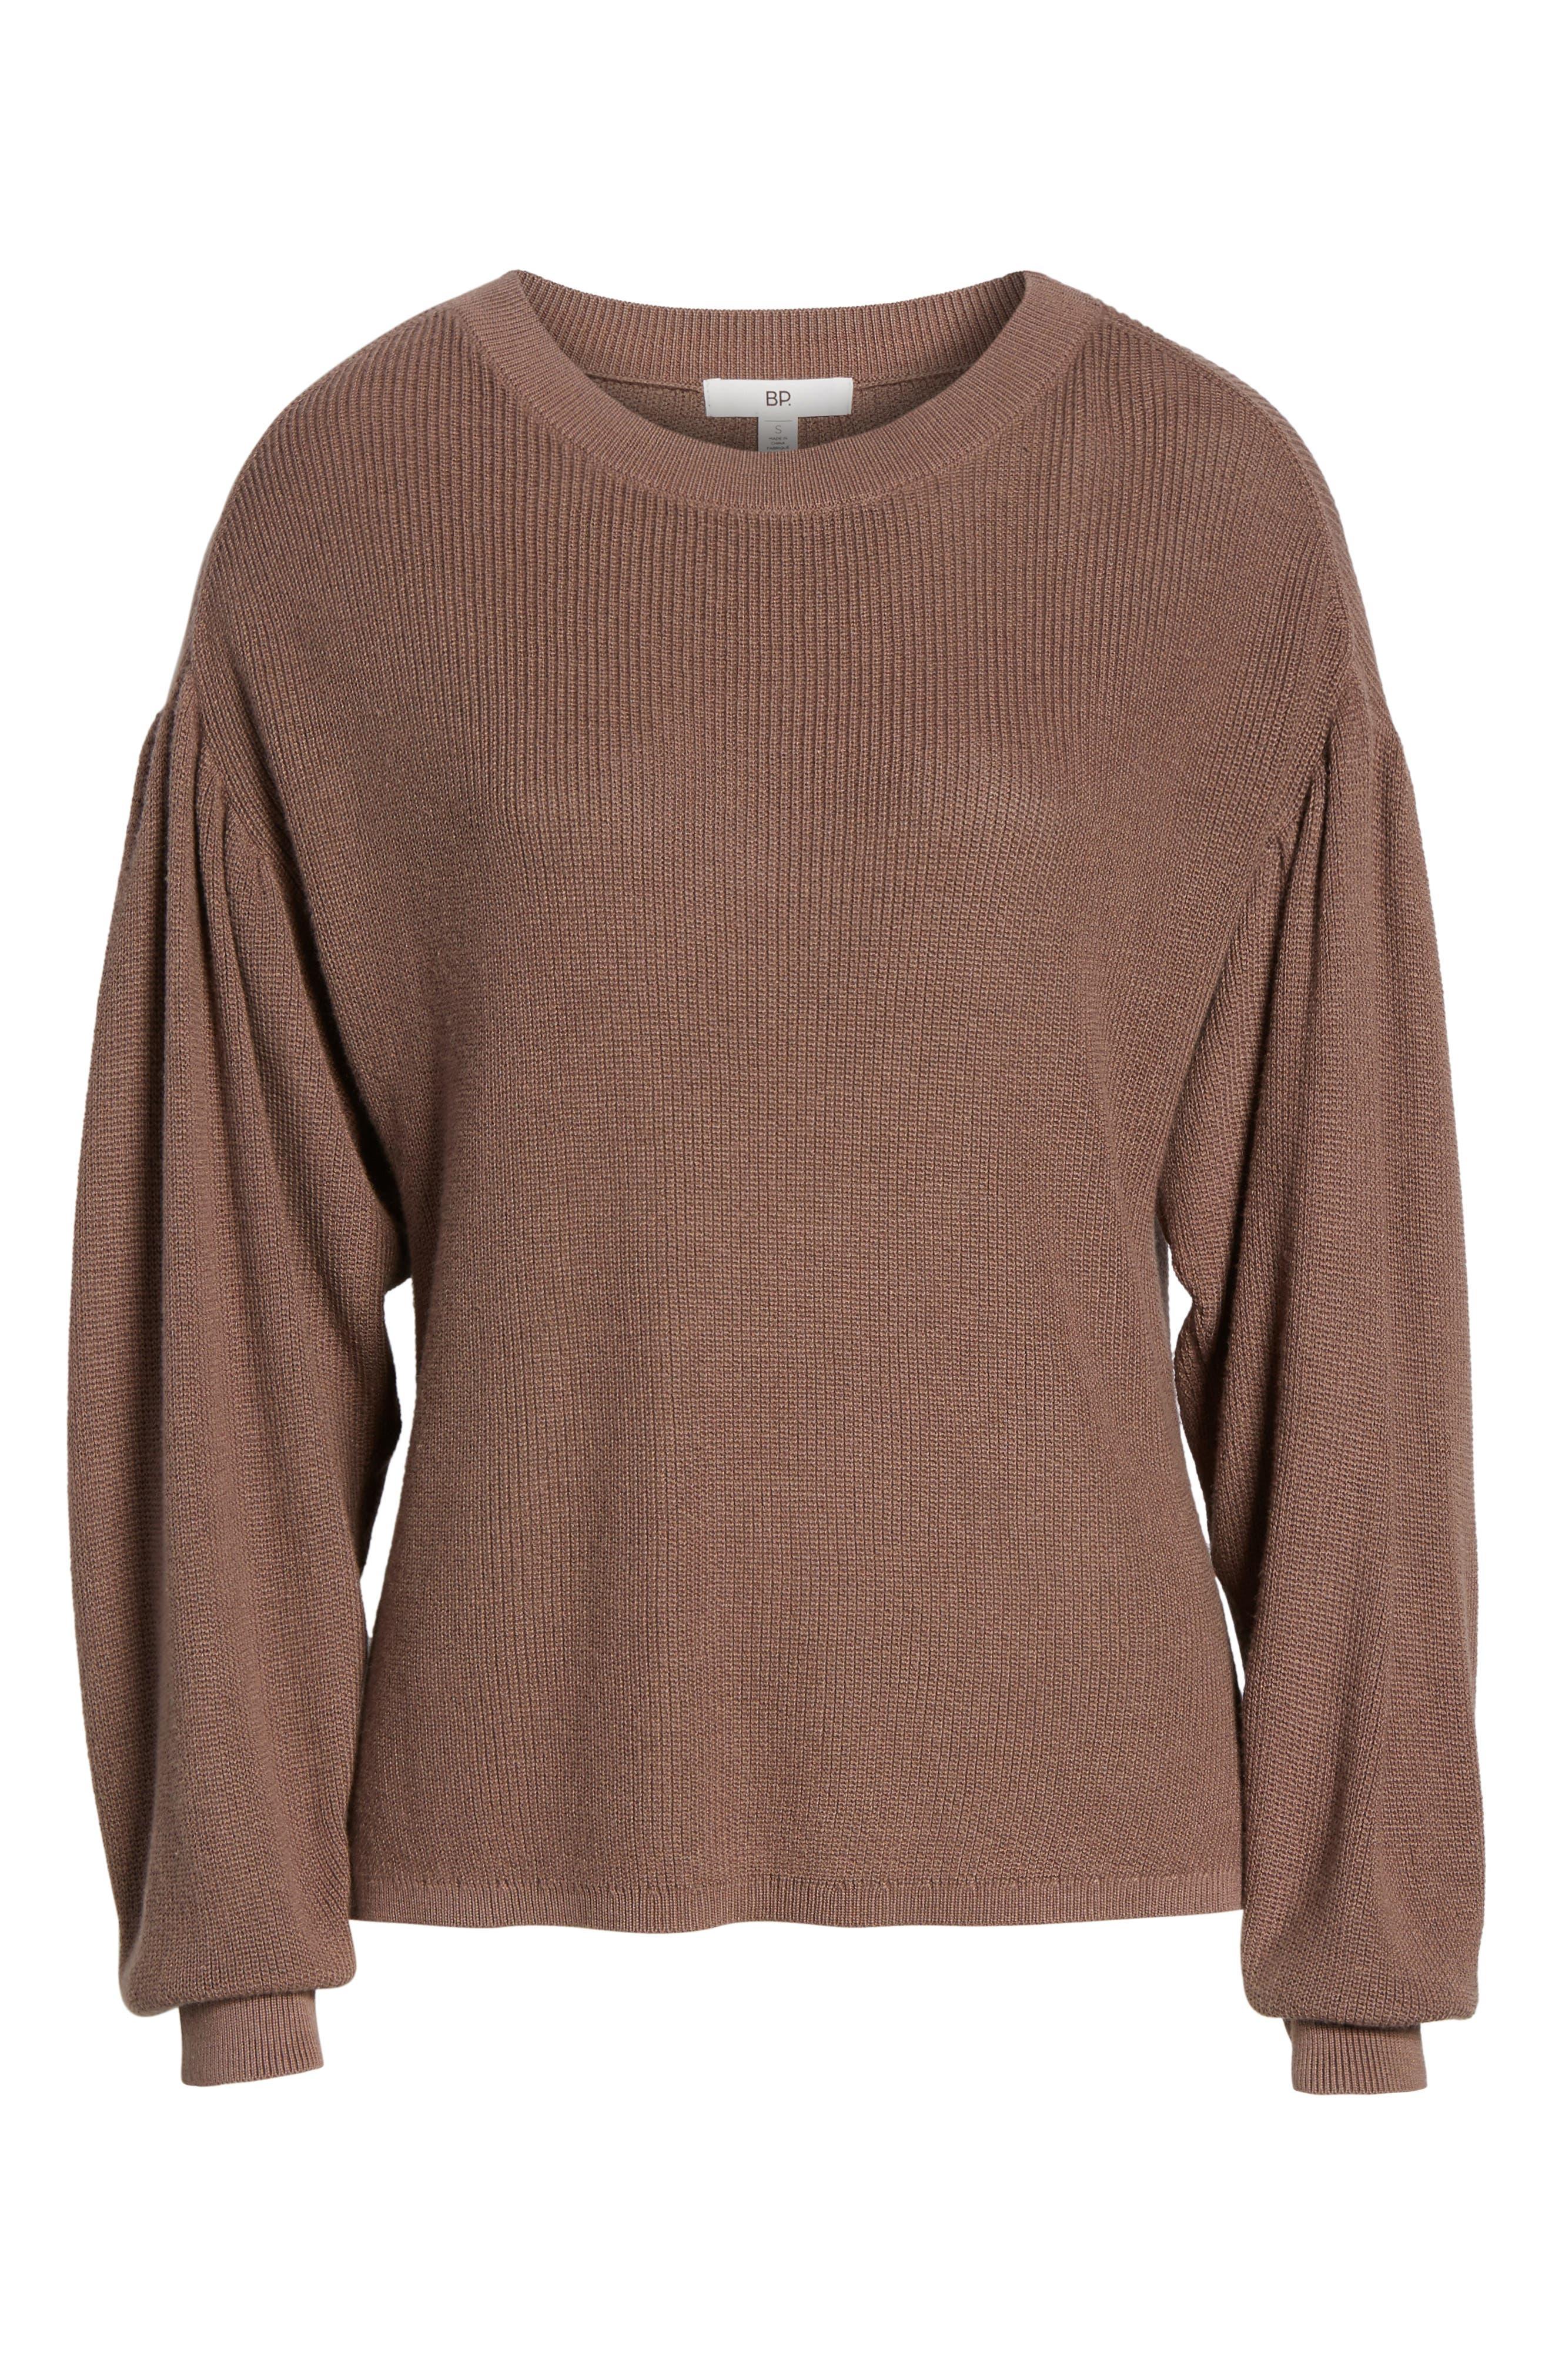 Drape Sleeve Sweater,                             Alternate thumbnail 6, color,                             230